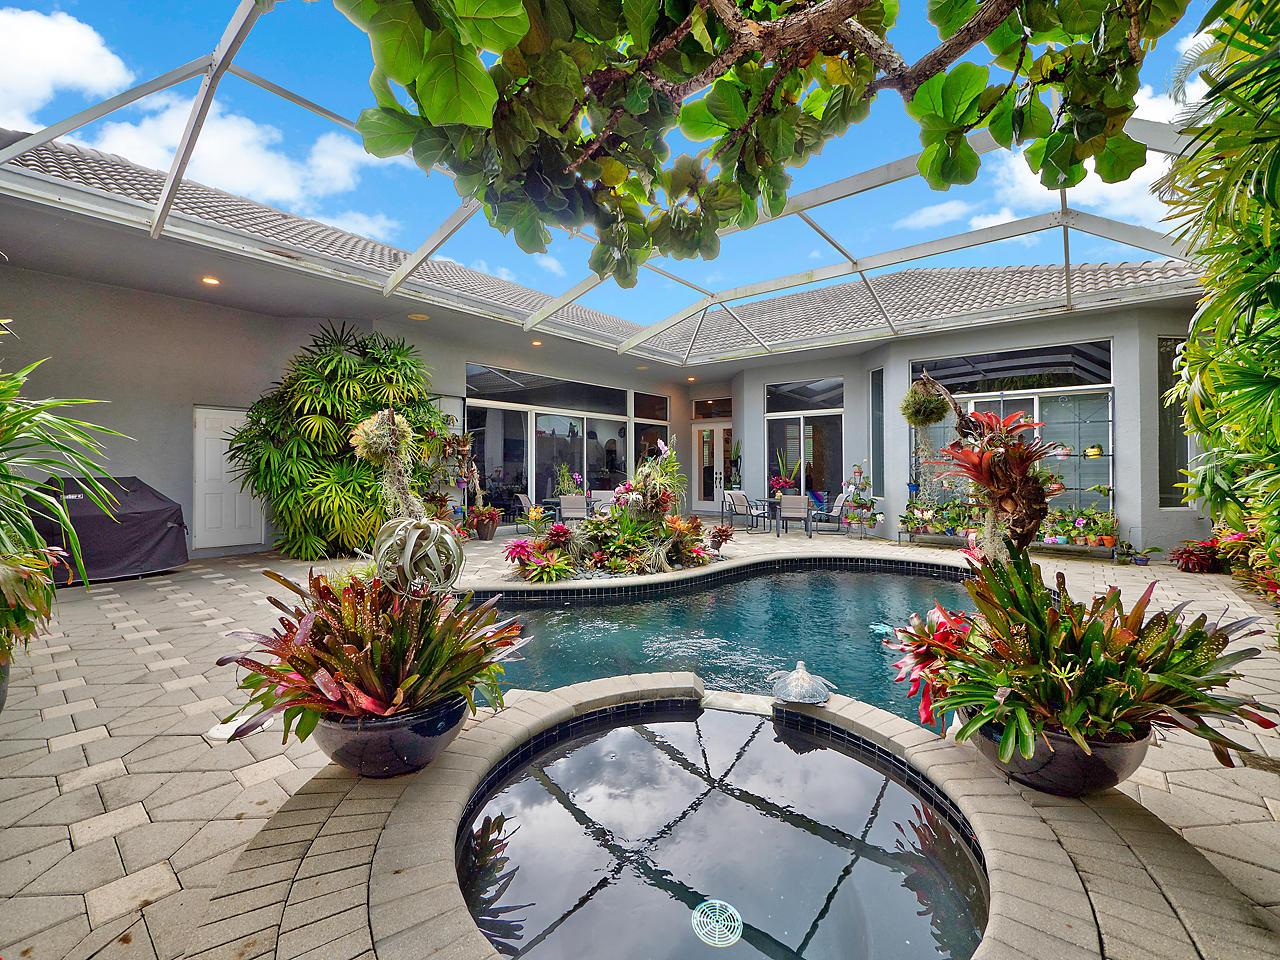 36 Bermuda Lake Drive, Palm Beach Gardens, Florida 33418, 3 Bedrooms Bedrooms, ,3 BathroomsBathrooms,A,Single family,Bermuda Lake,RX-10462526